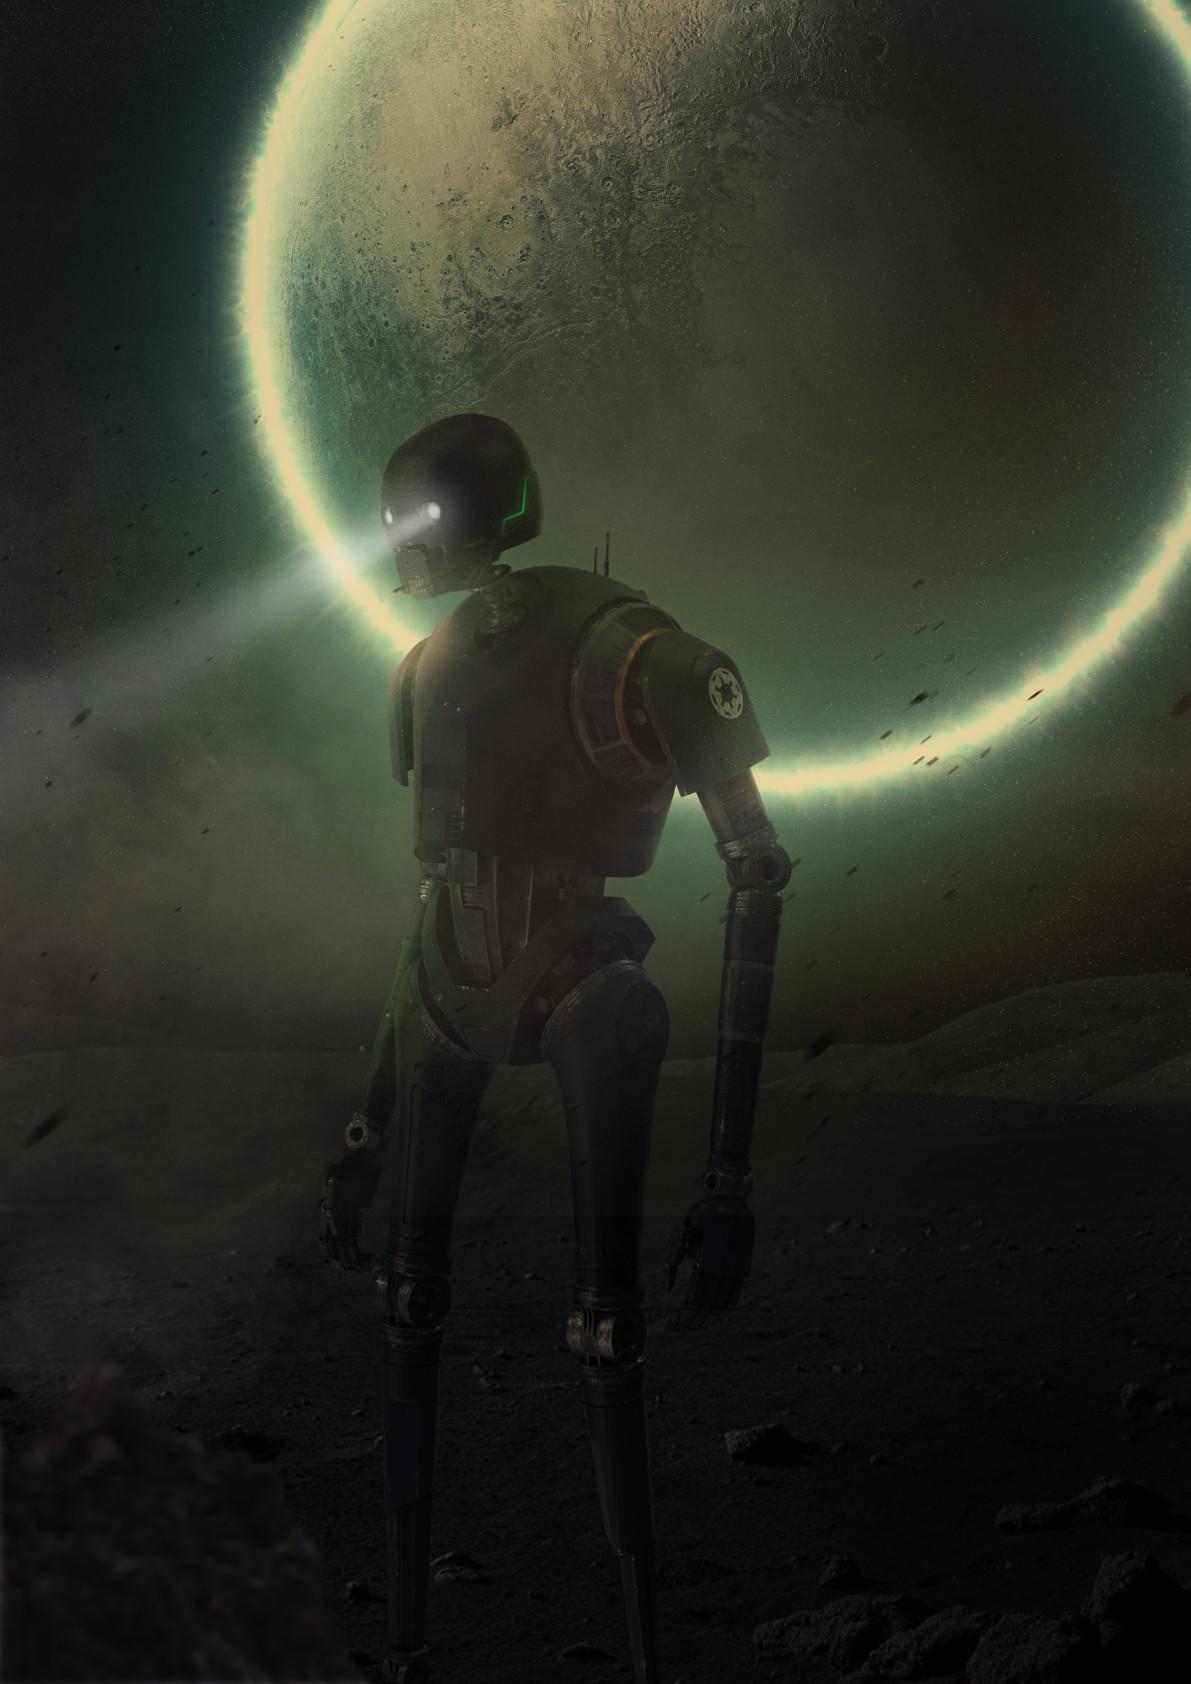 K-2SO - арт от Matt Seff Barnes, арт, кино, фантастика, Звездные войны, Изгой-один, Star Wars, роботы, картинки, Matt Seff Barnes, Изгой-один: Звёздные Войны. Истории, Rogue One: A Star Wars Story